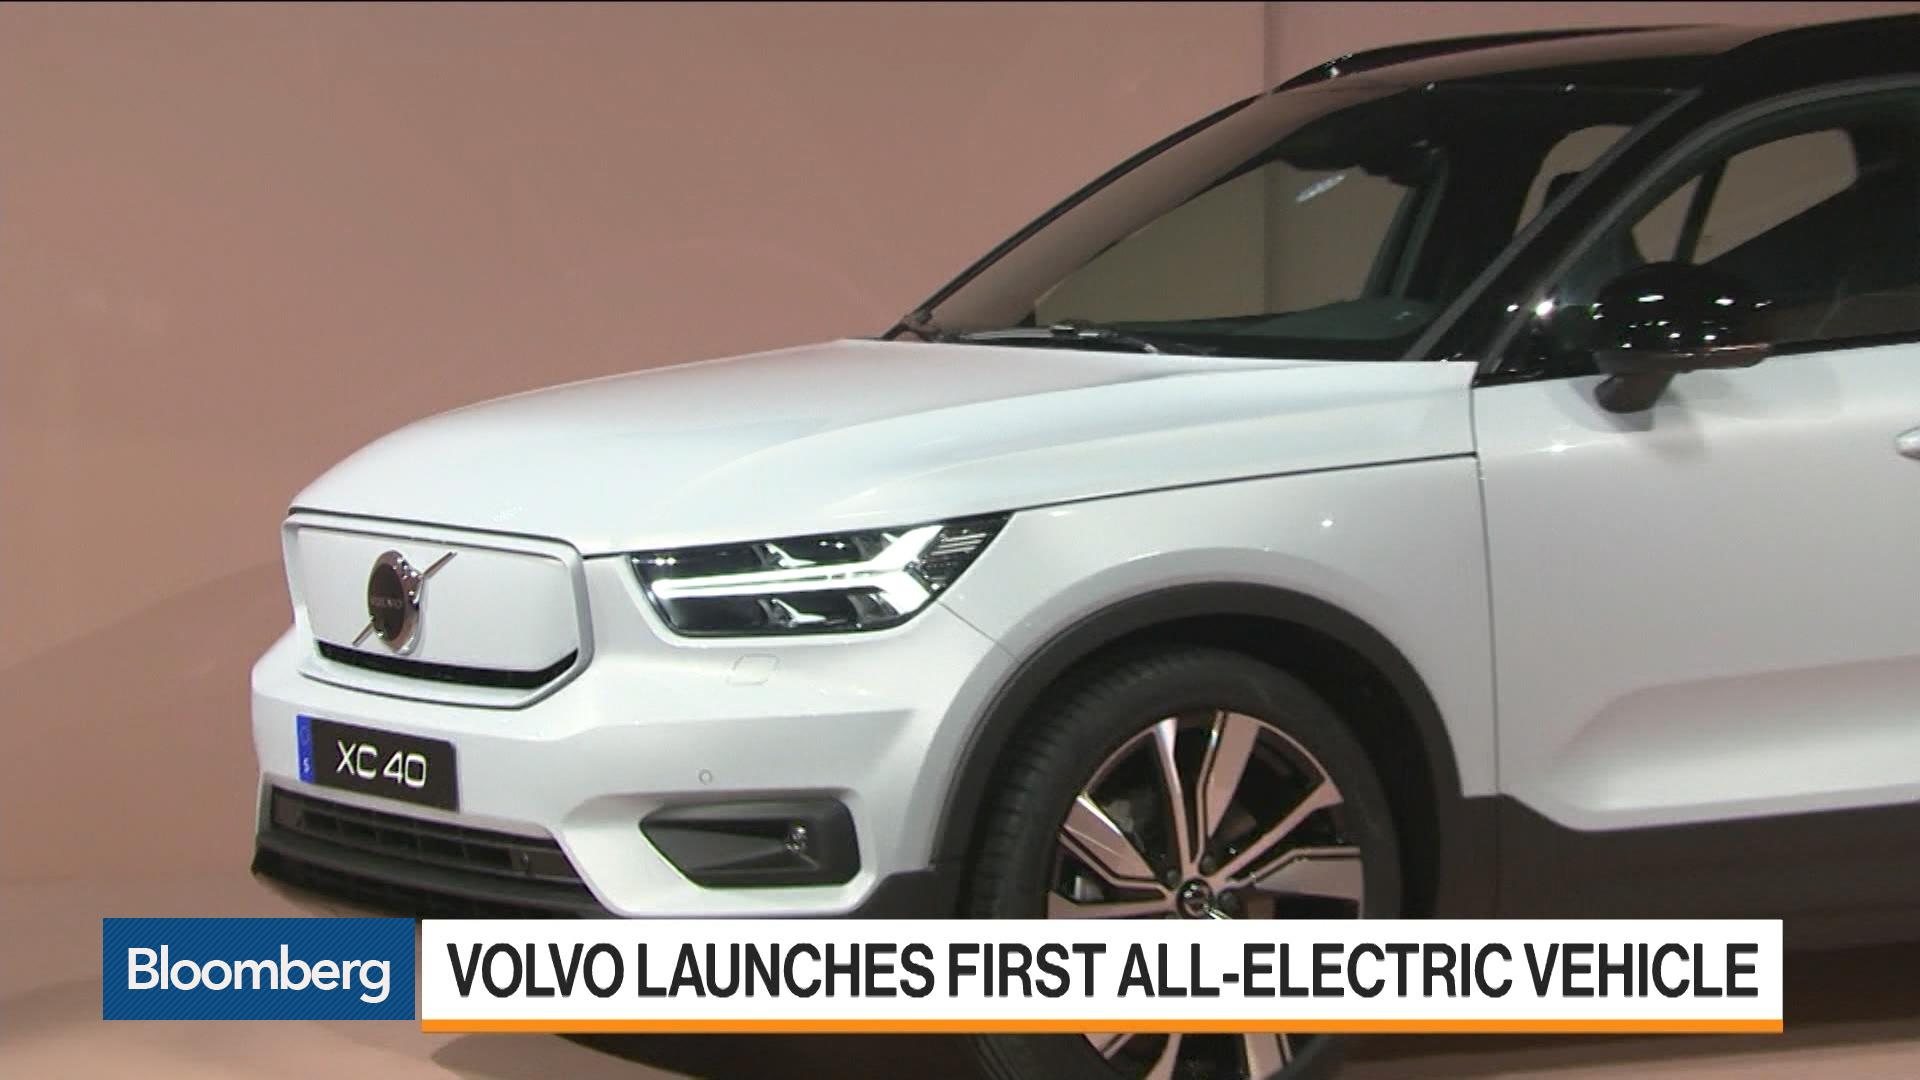 Volvo Cars CEO Hakan Samuelsson: XC40 Recharge EV, Hybrid